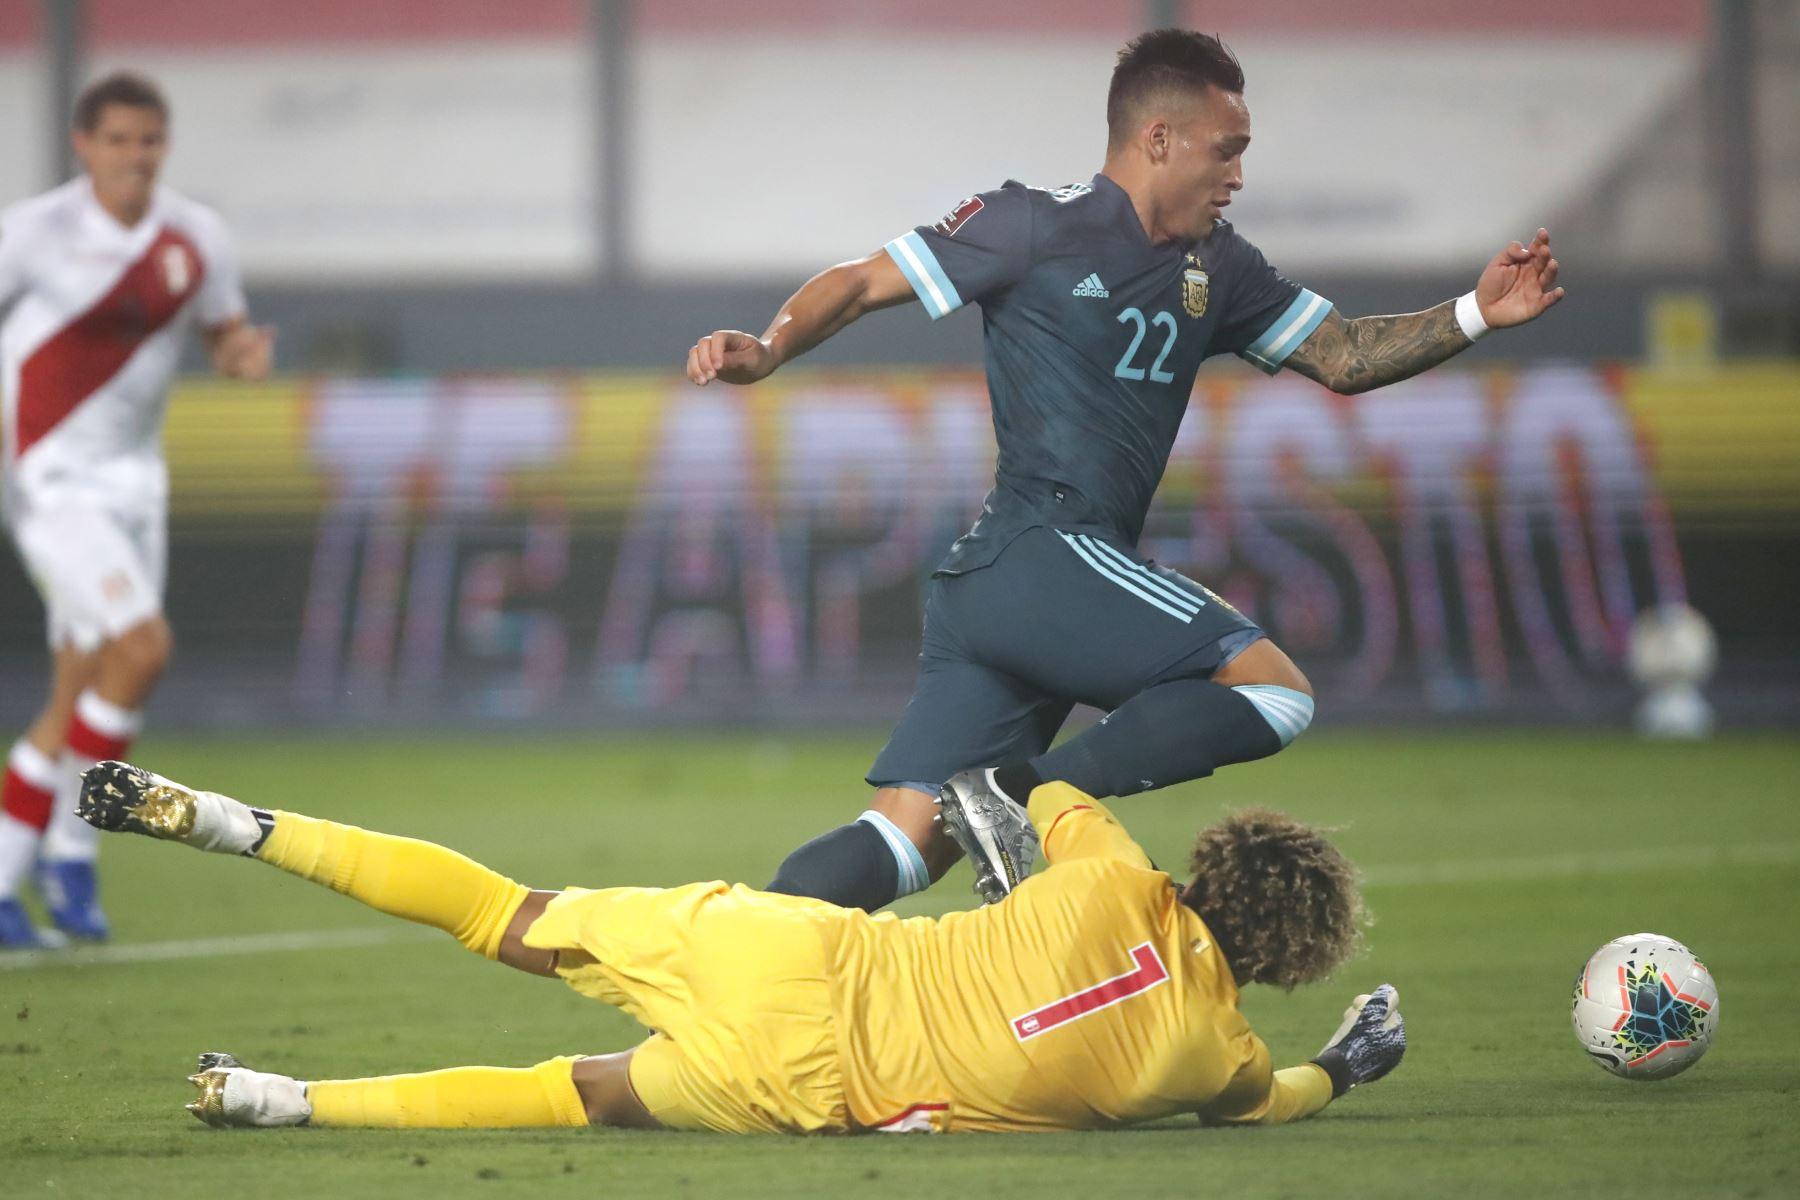 Laurato Martínez anota el segundo gol. Argentina derrota 2 a 0 a la selección de Perú.  Foto: Pool FPF